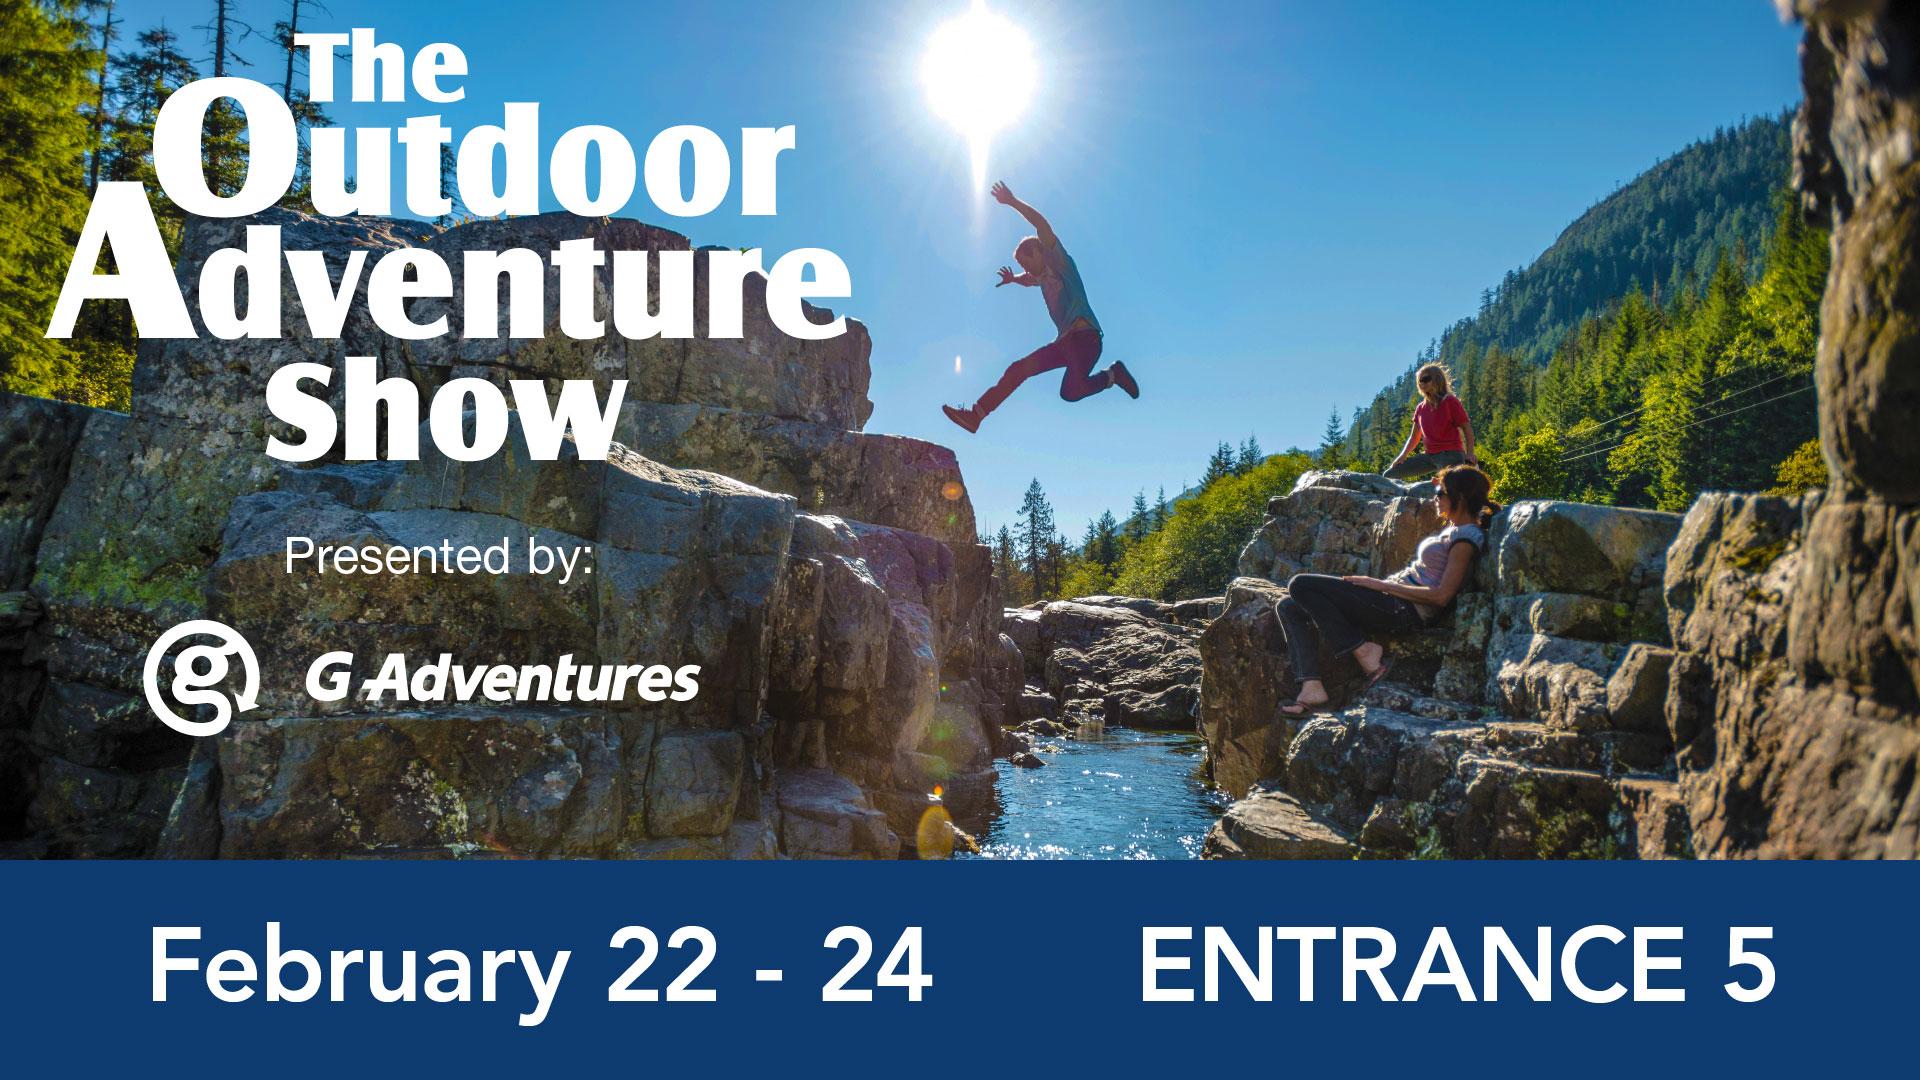 The Outdoor Adventure Show